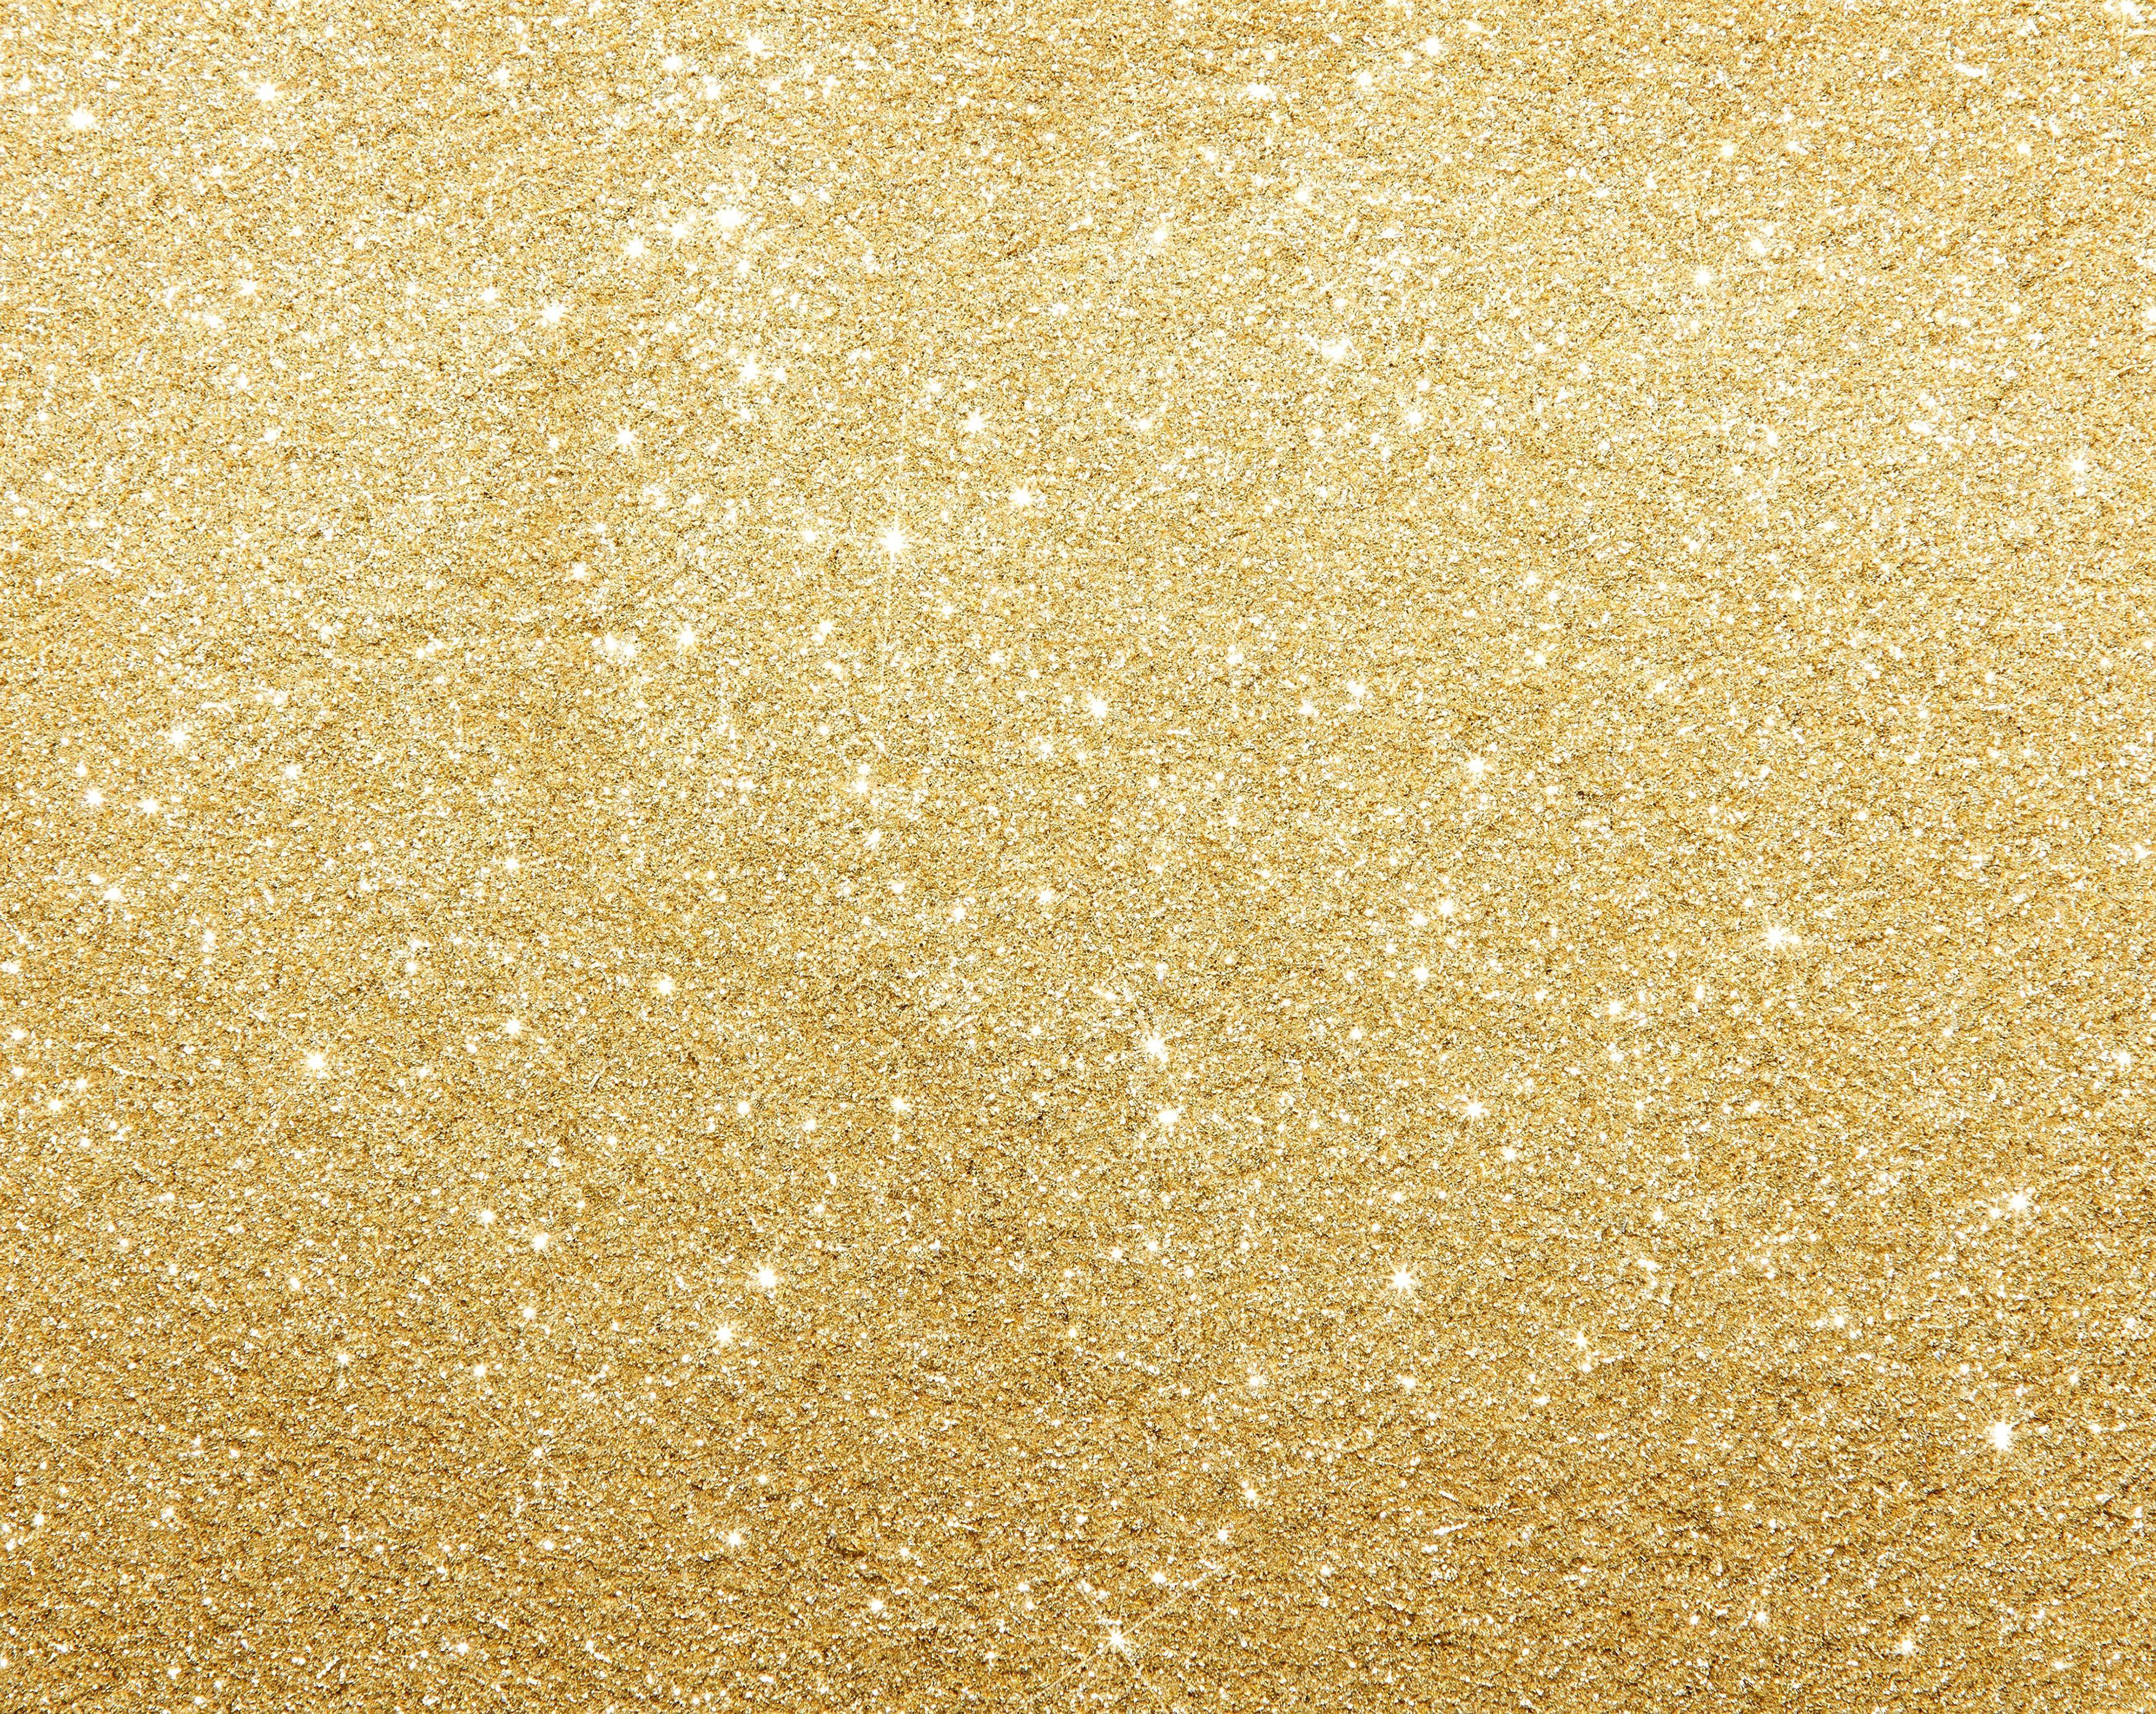 Gold Glitter Iphone Backgrounds Gold glitter t 3509x2789